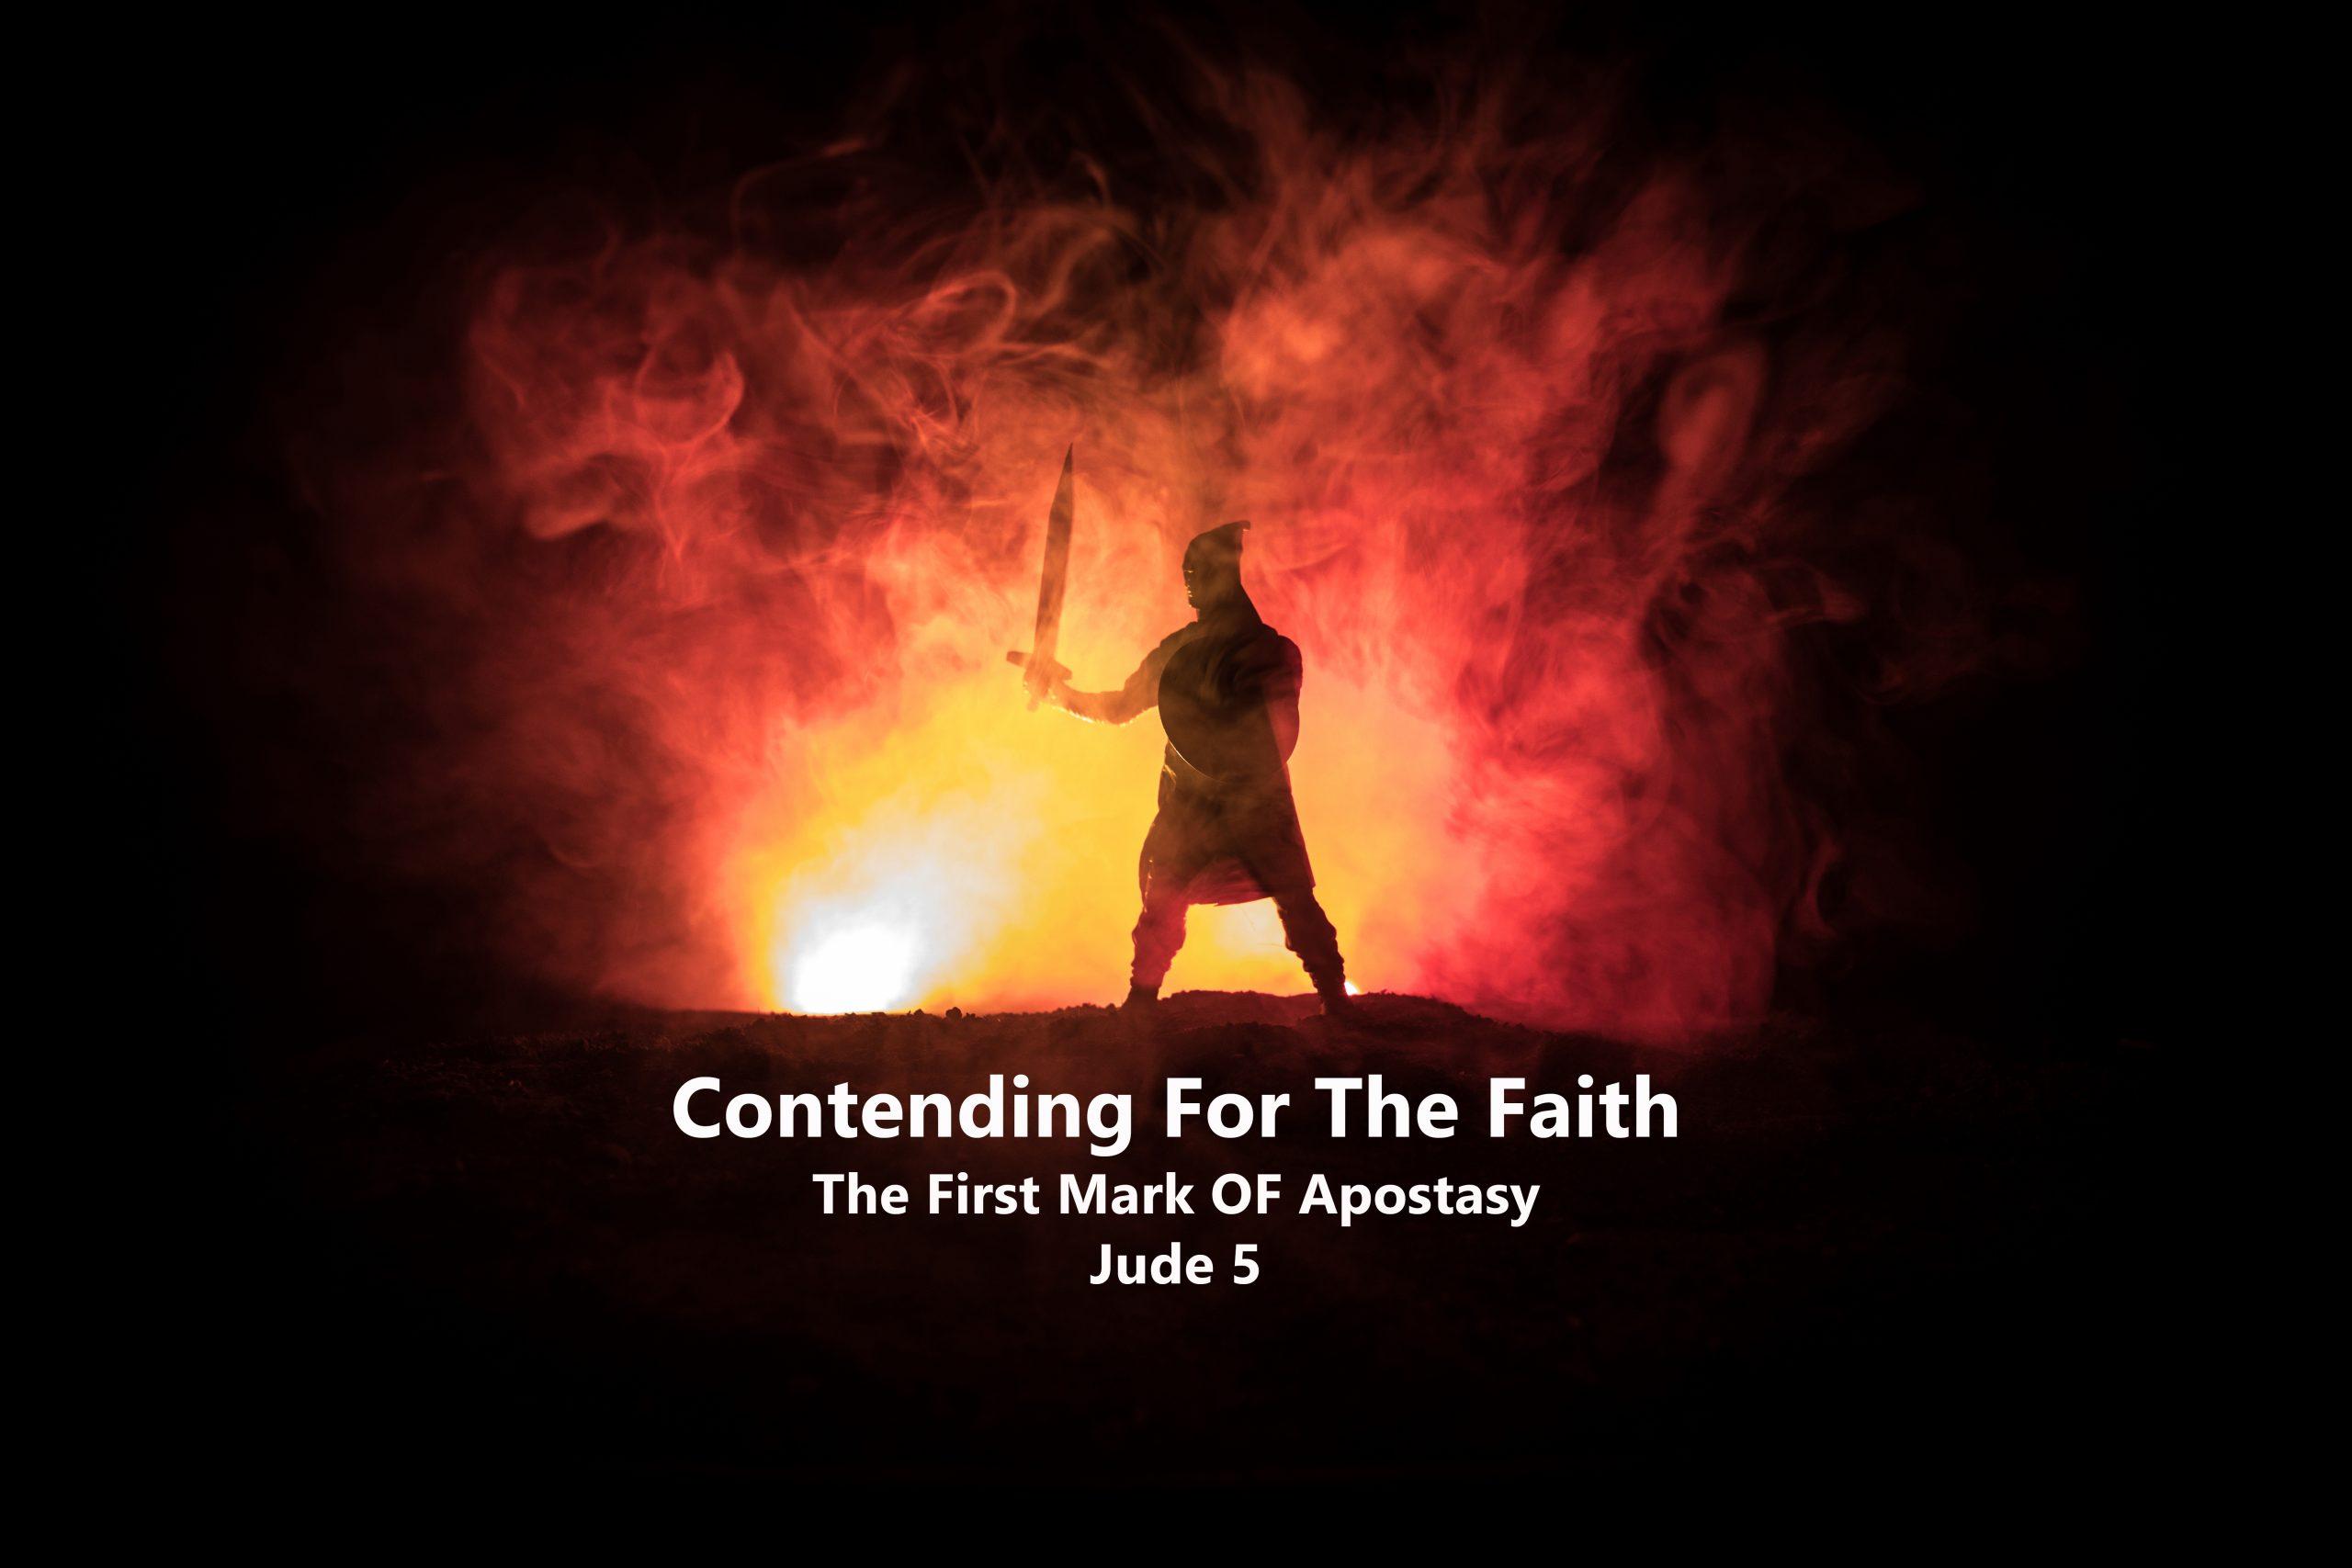 Jude v 5 The First Mark Of Apostasy